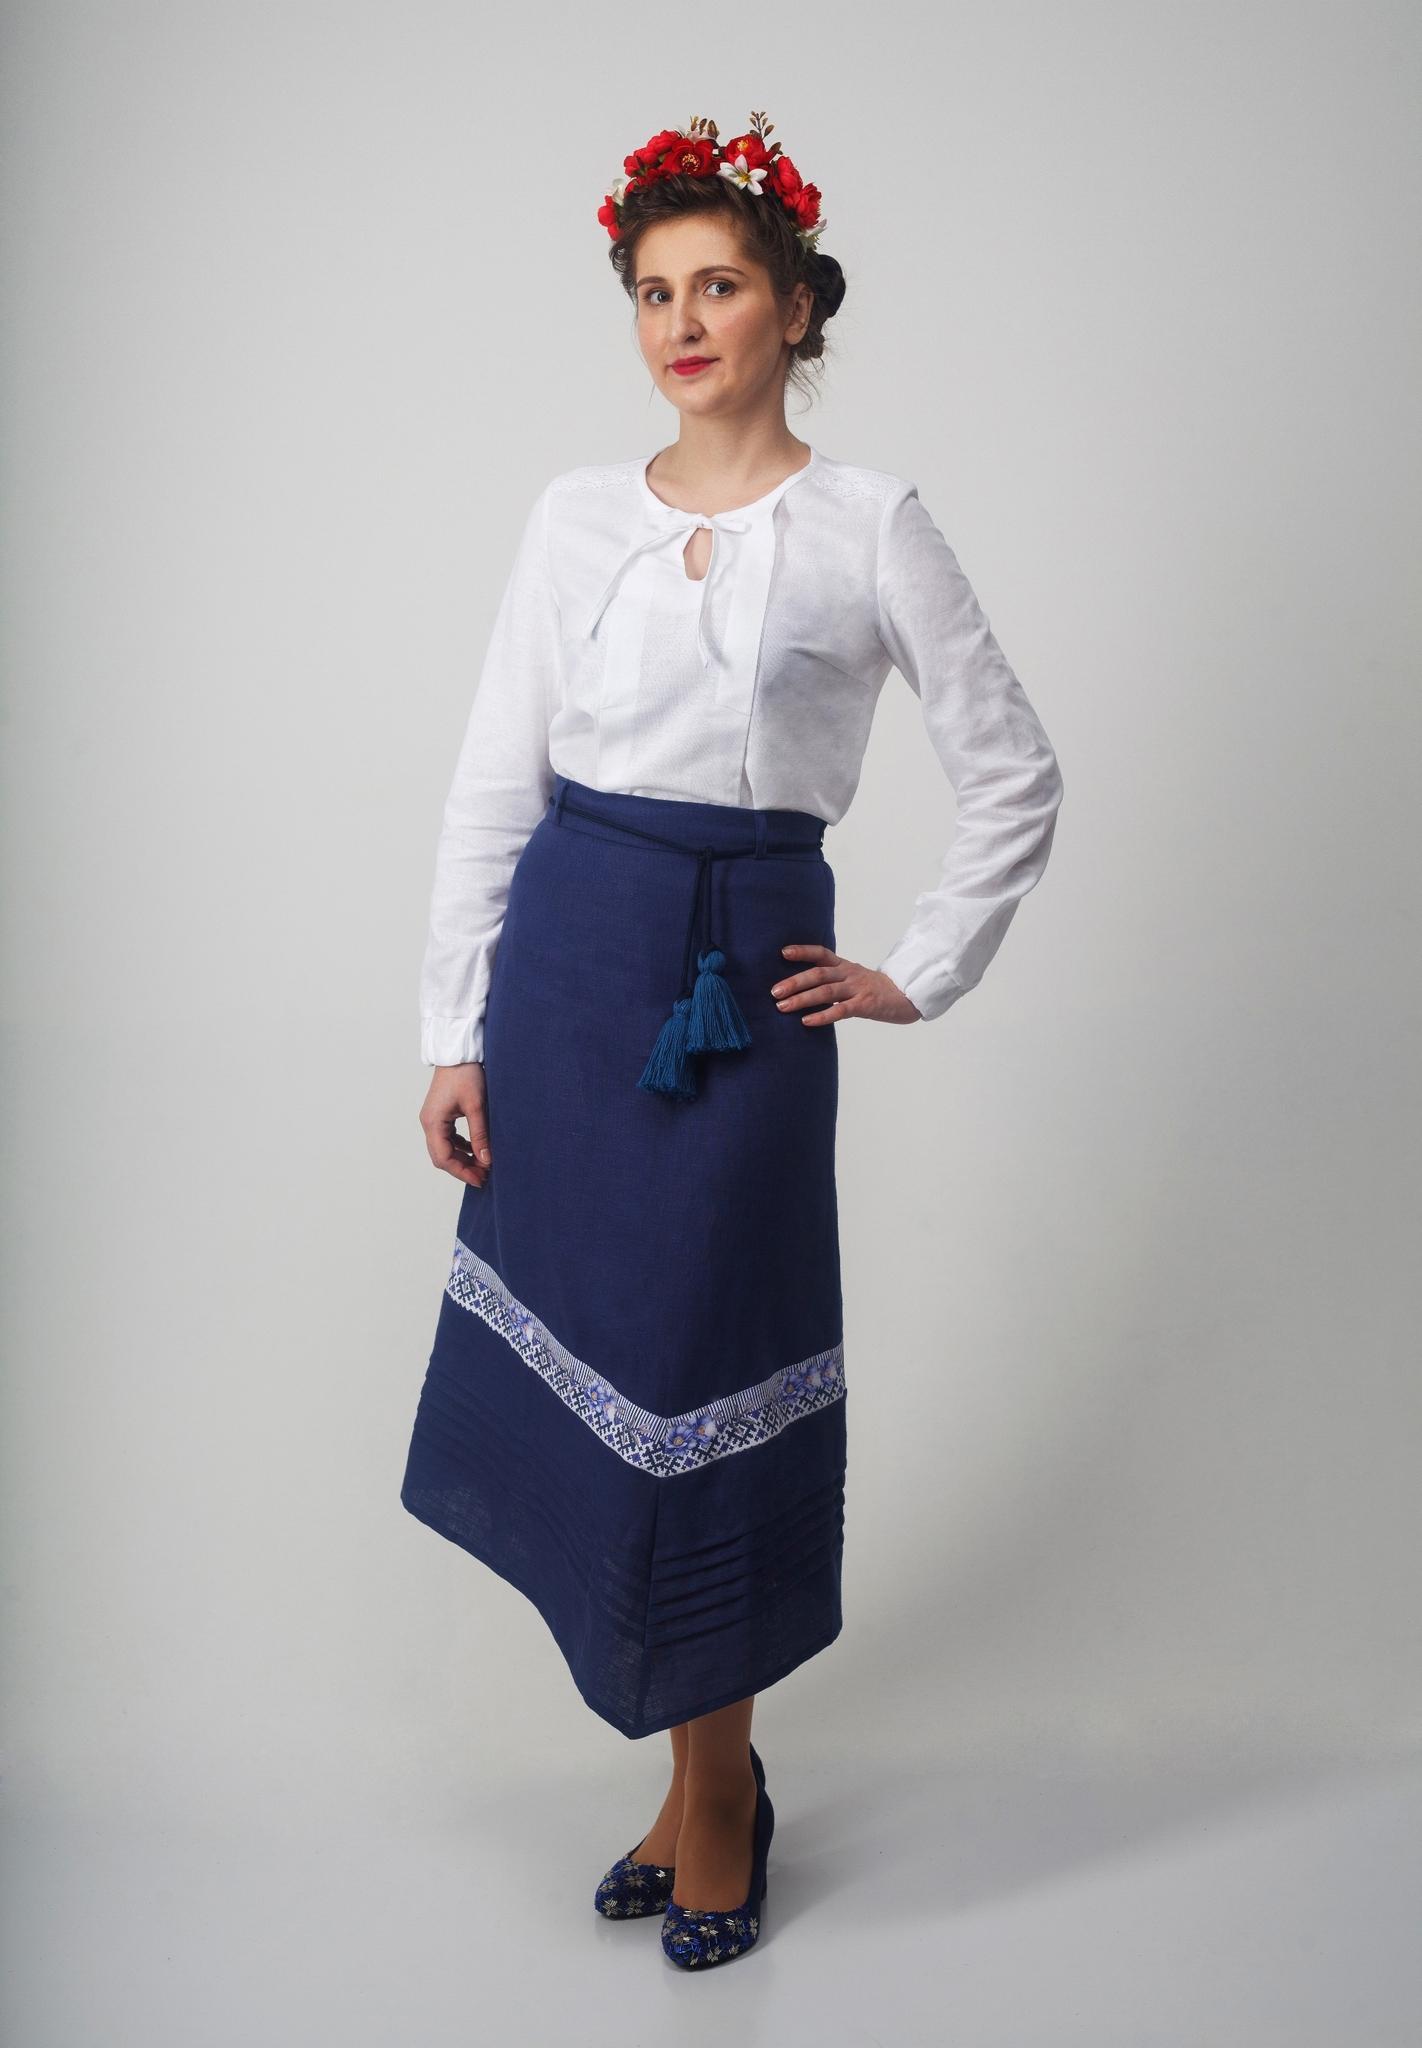 Блуза Самоцветы Хрусталь с Юбкой клином